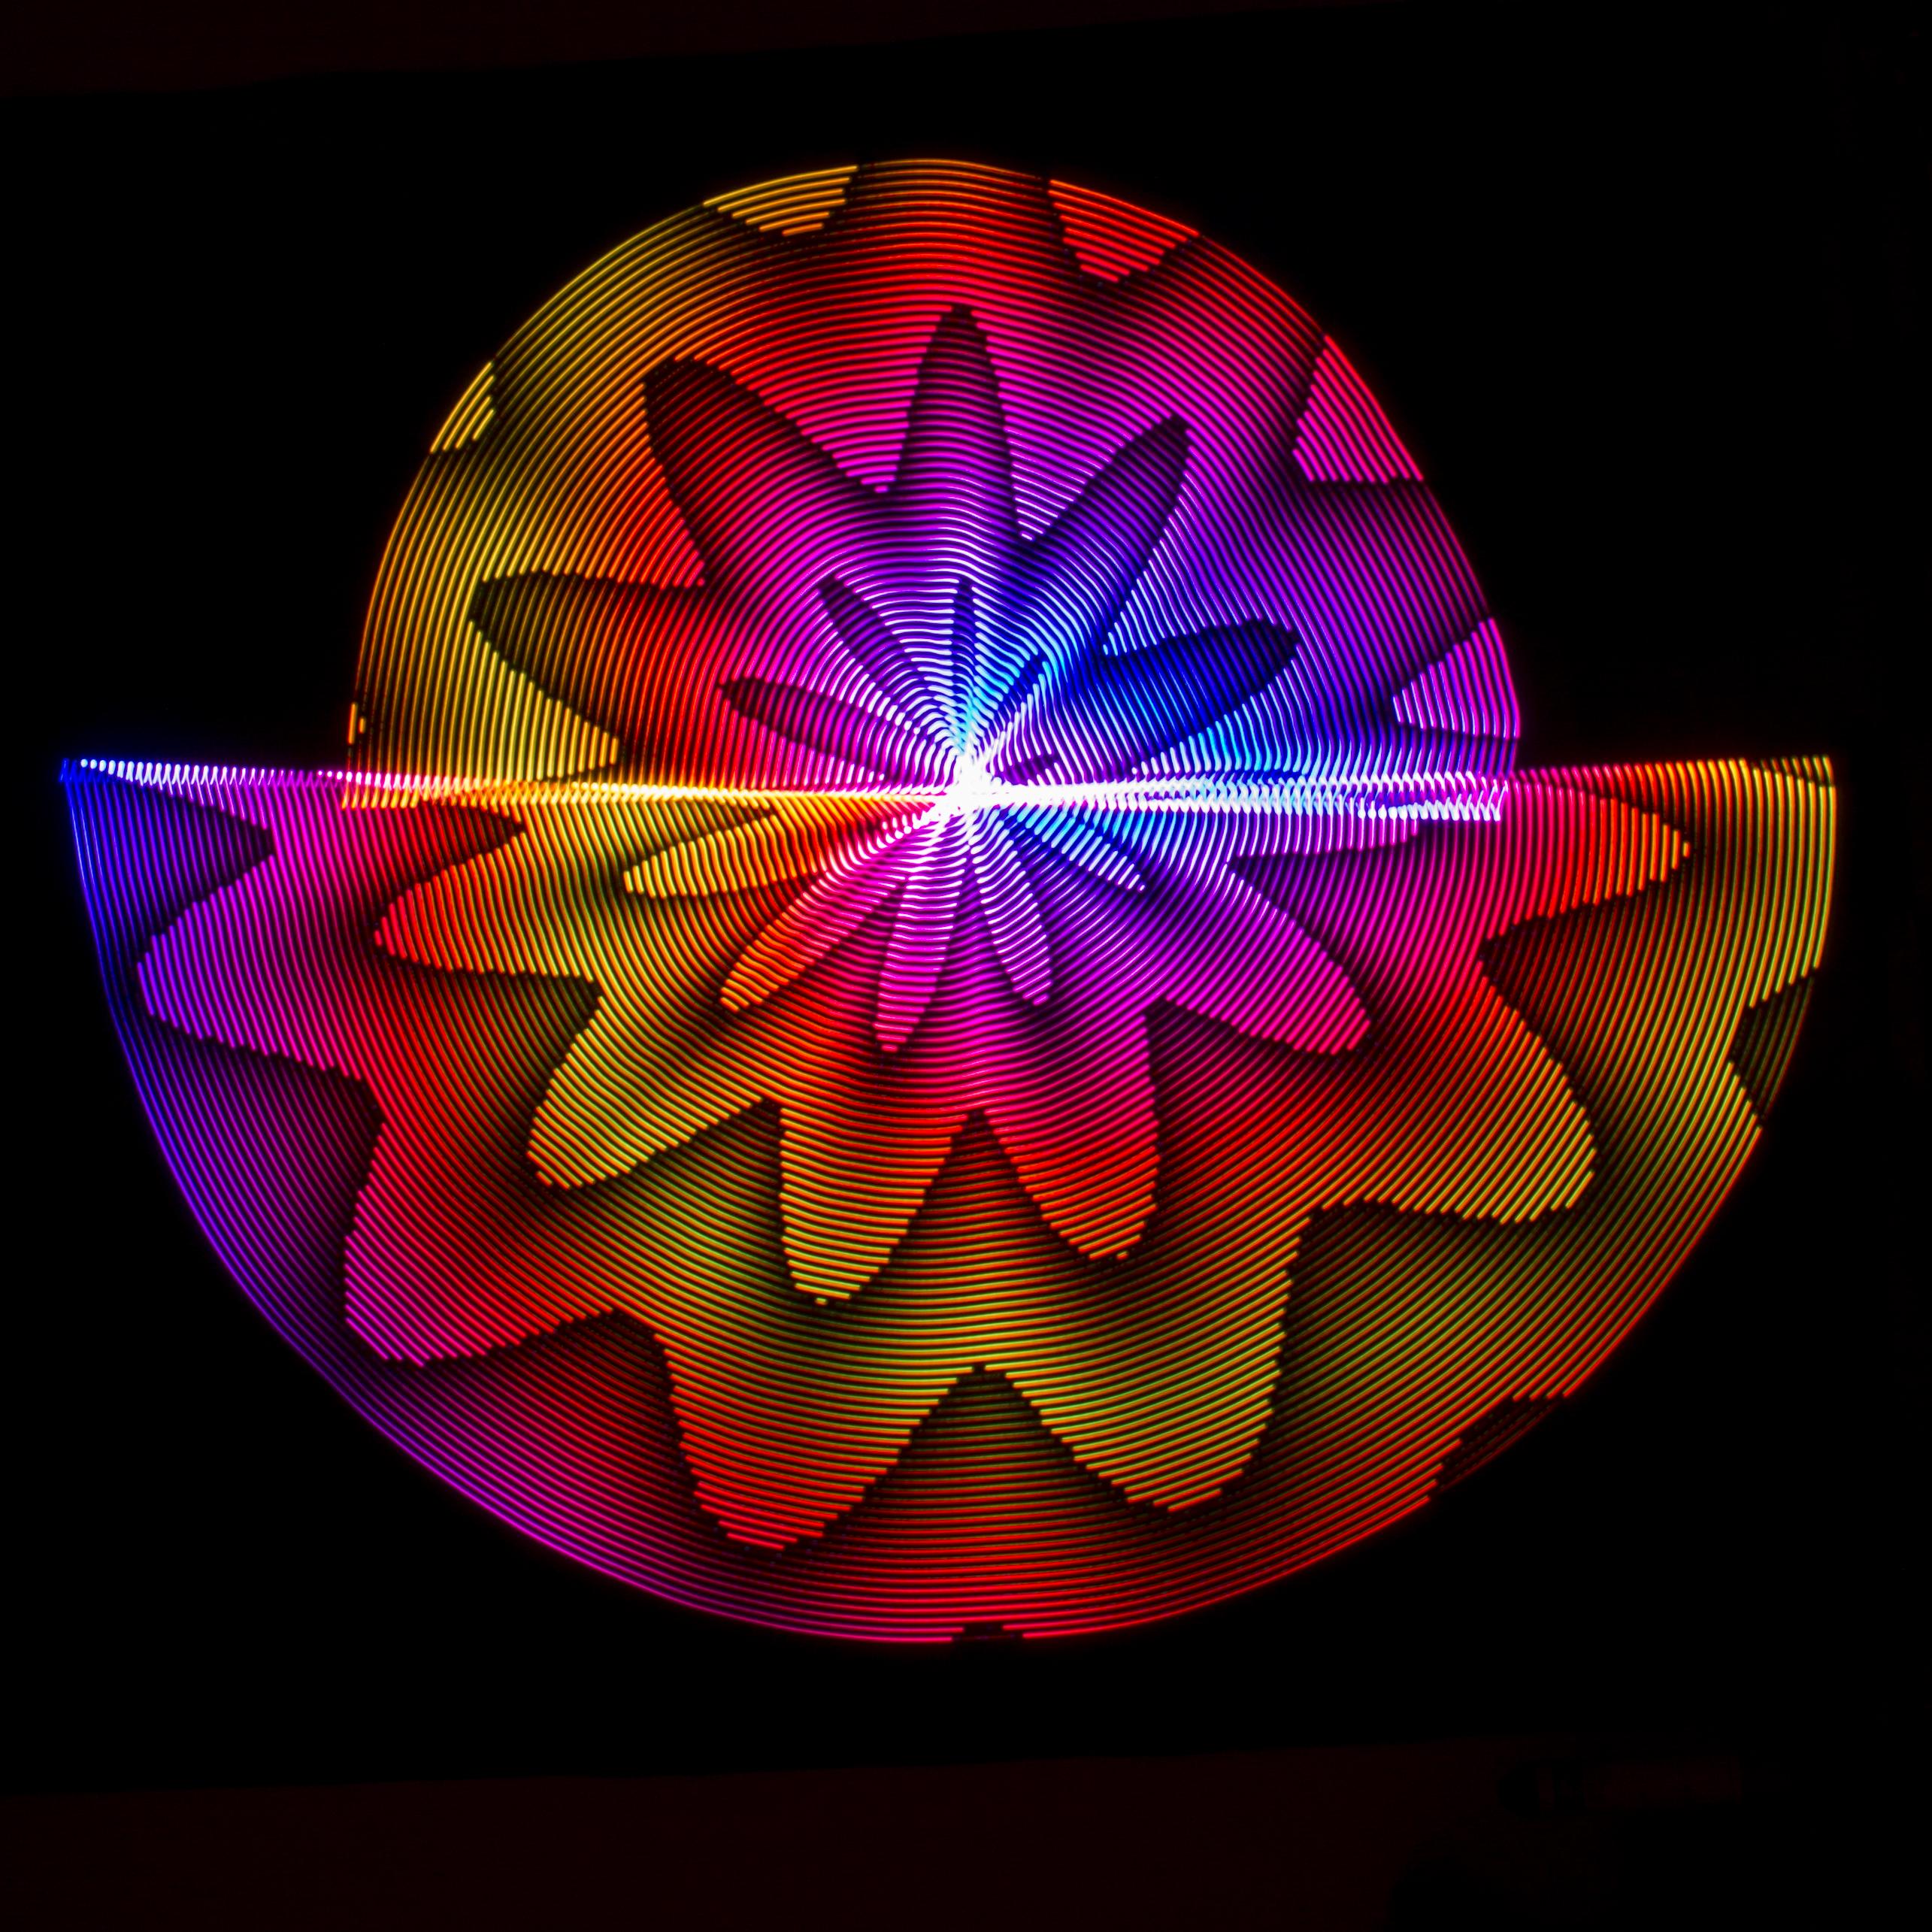 free images light leaf flower purple petal pattern red